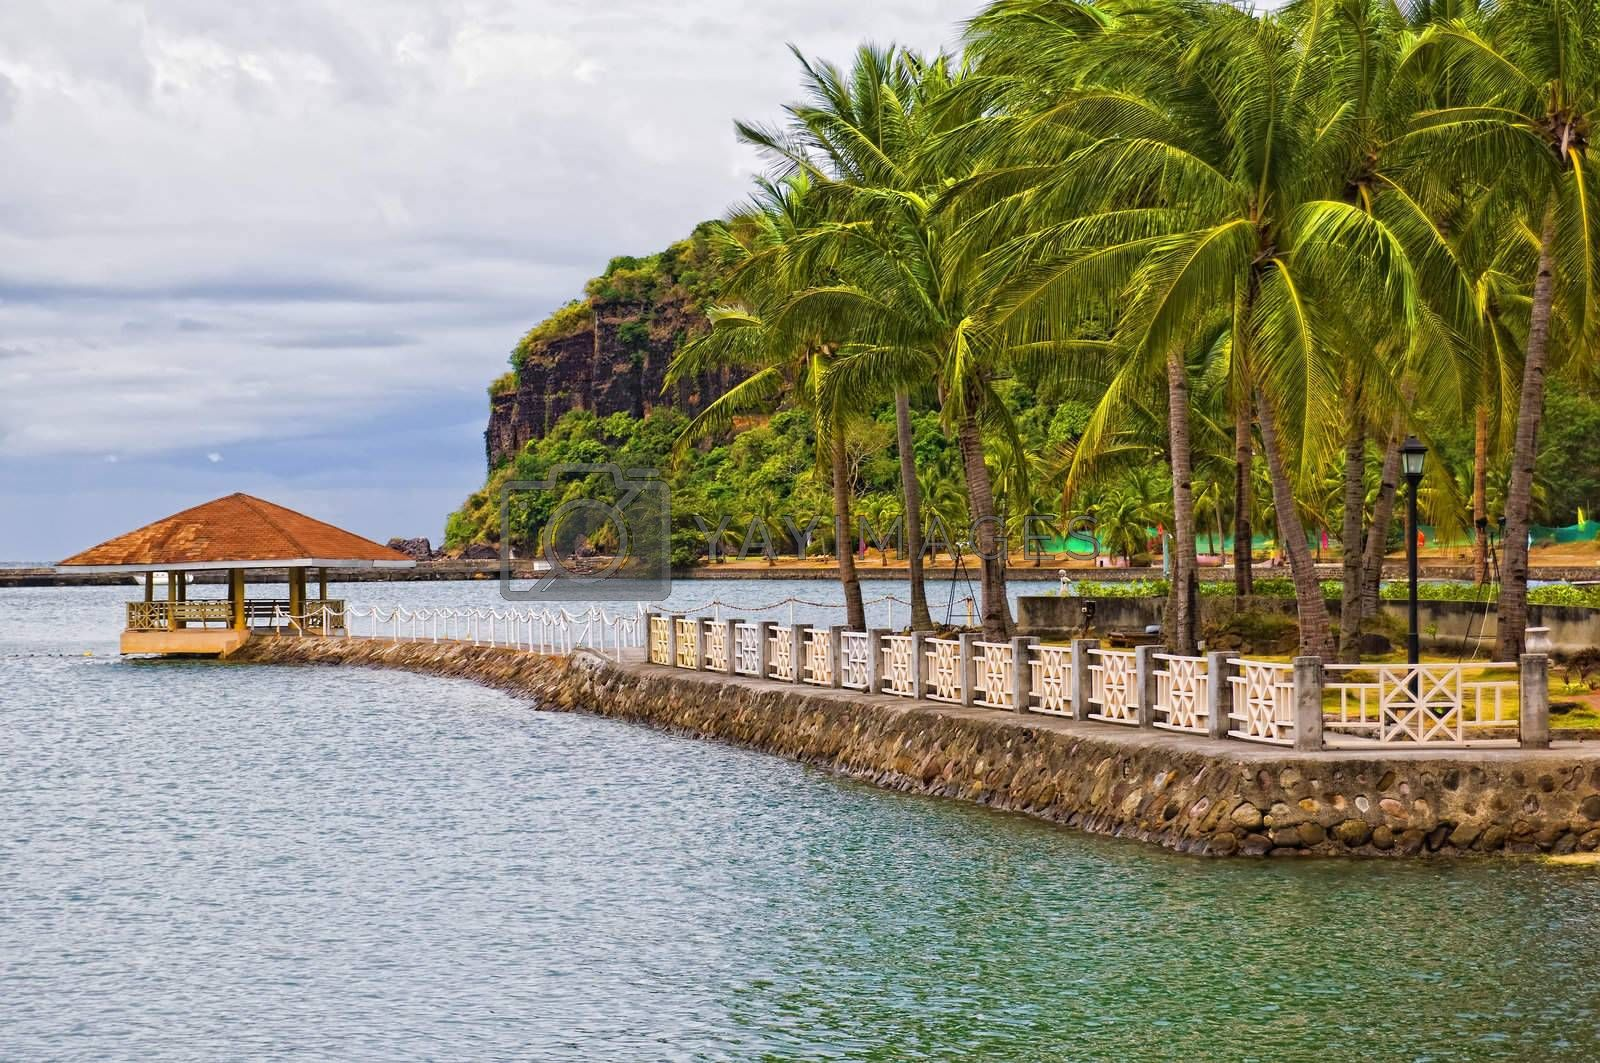 Royalty free image of Caylabne Resort by tonyoquias